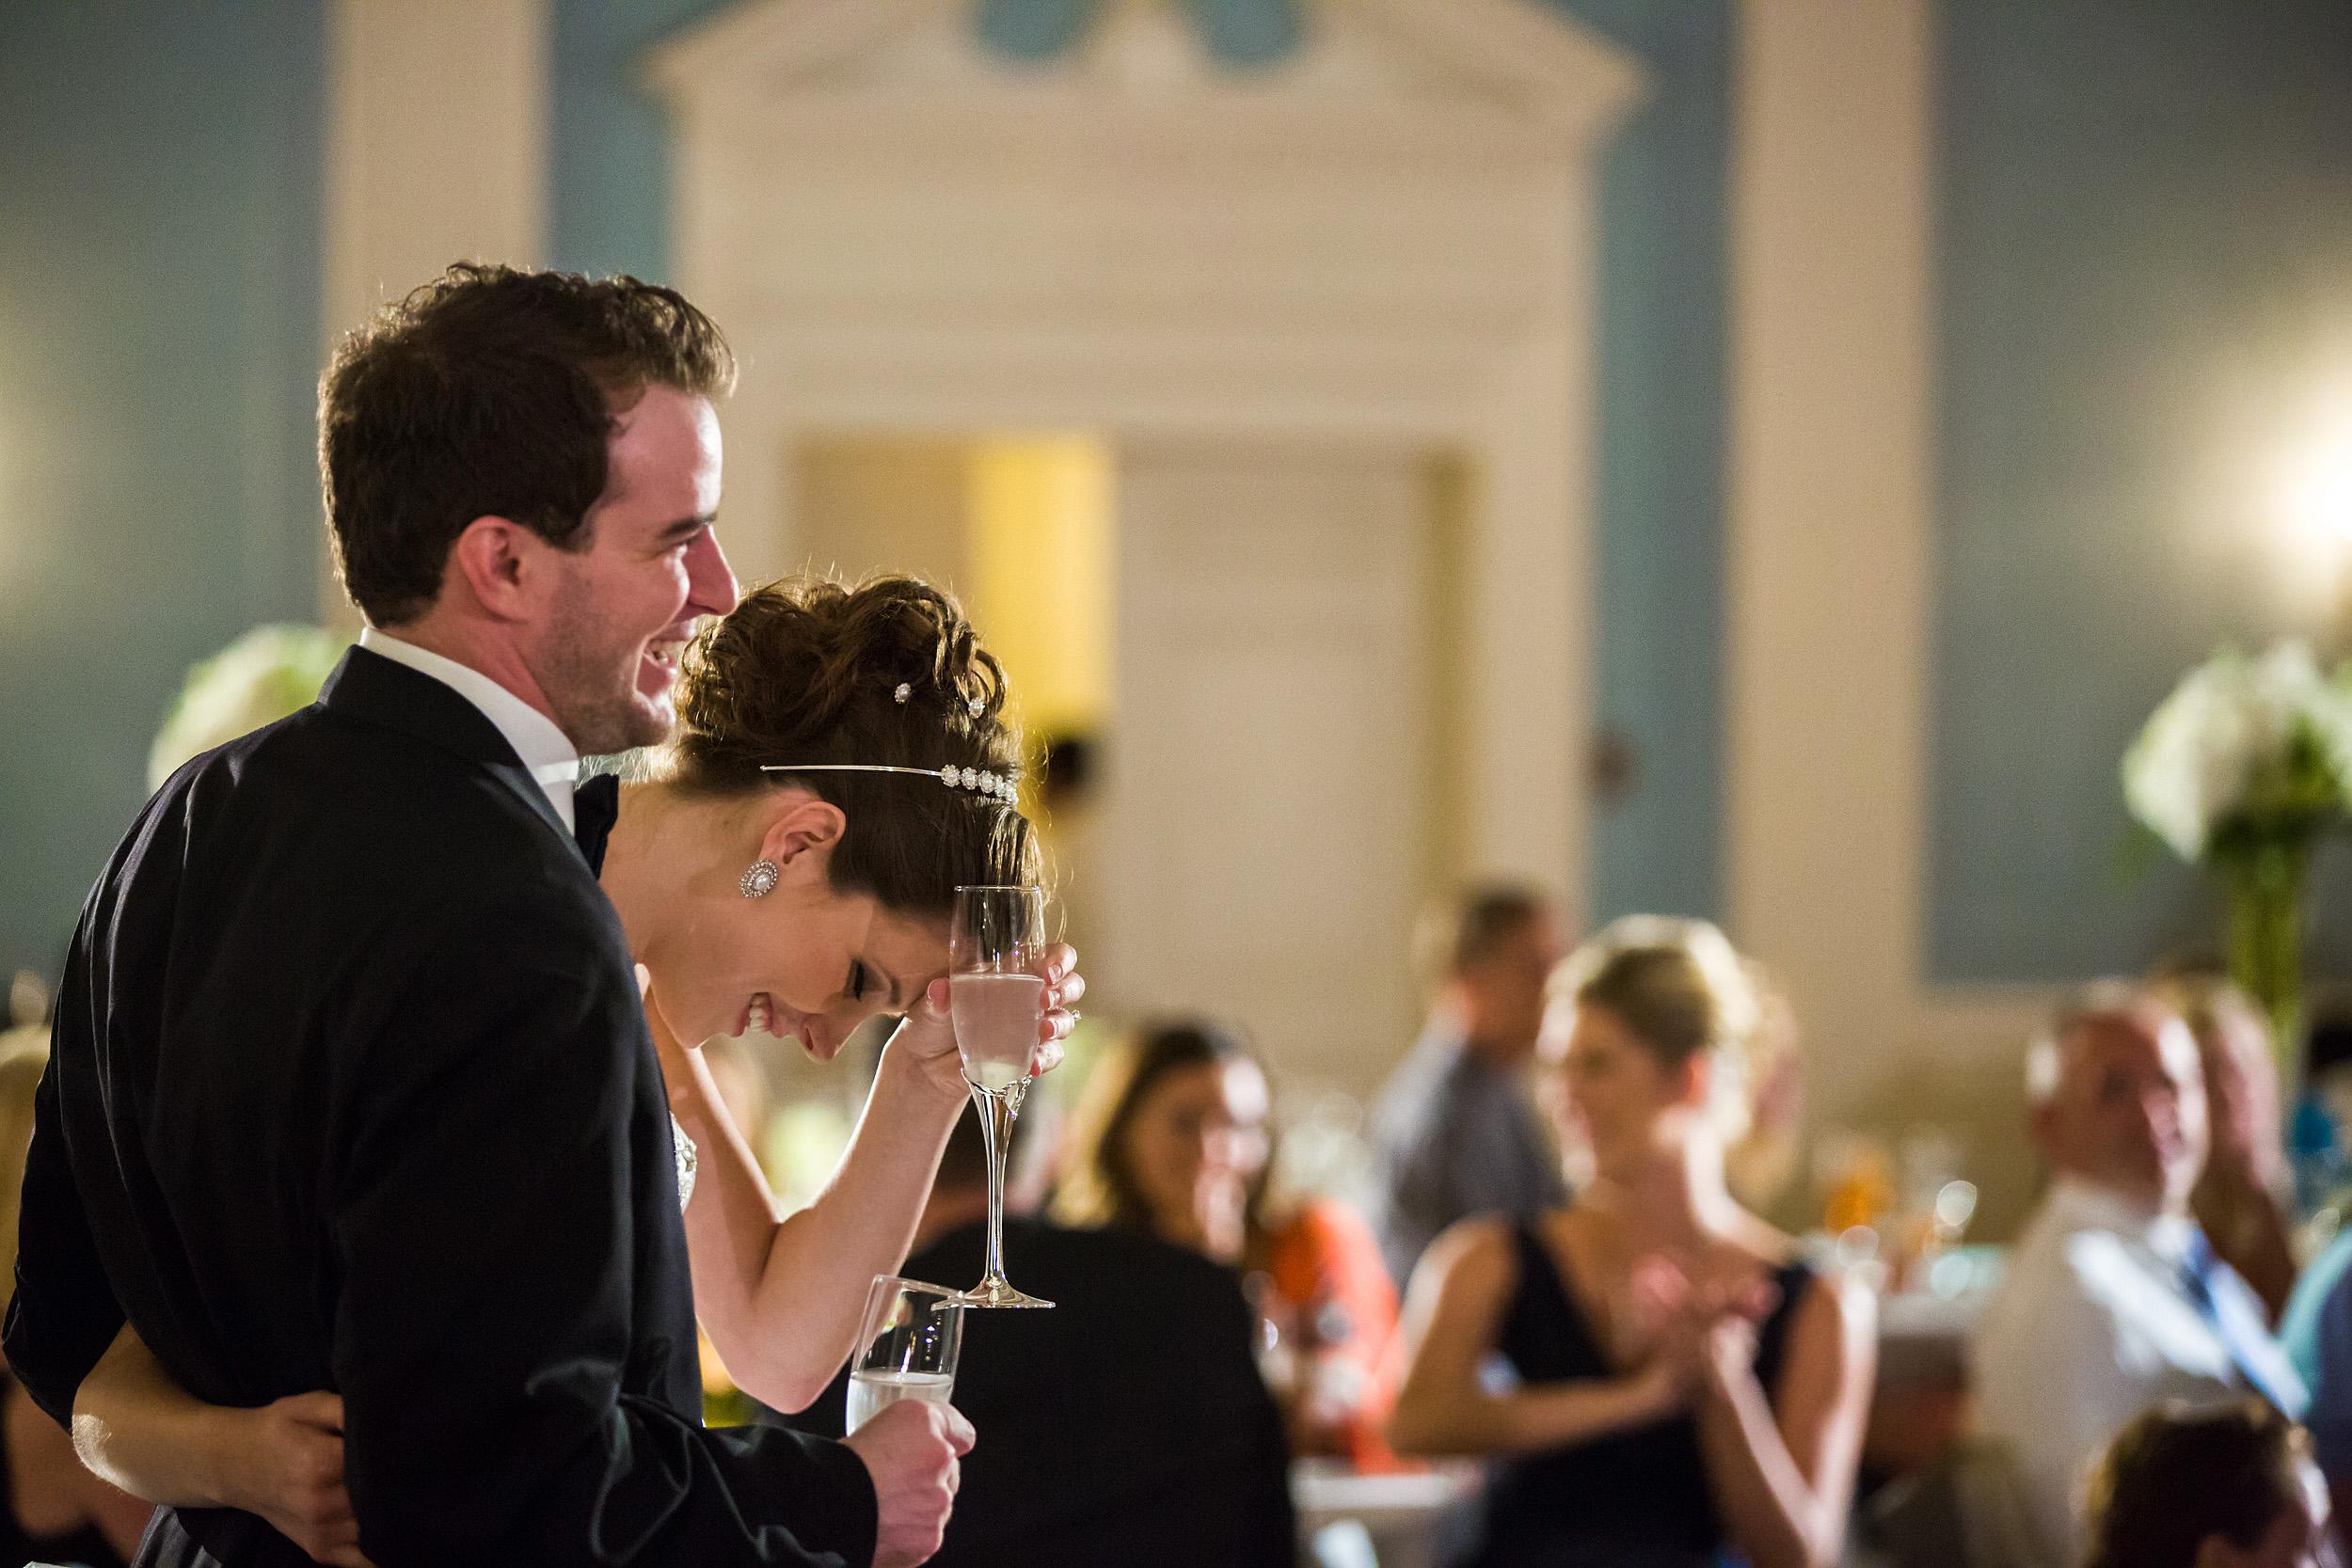 austin-wedding-mike-reed-31.jpg